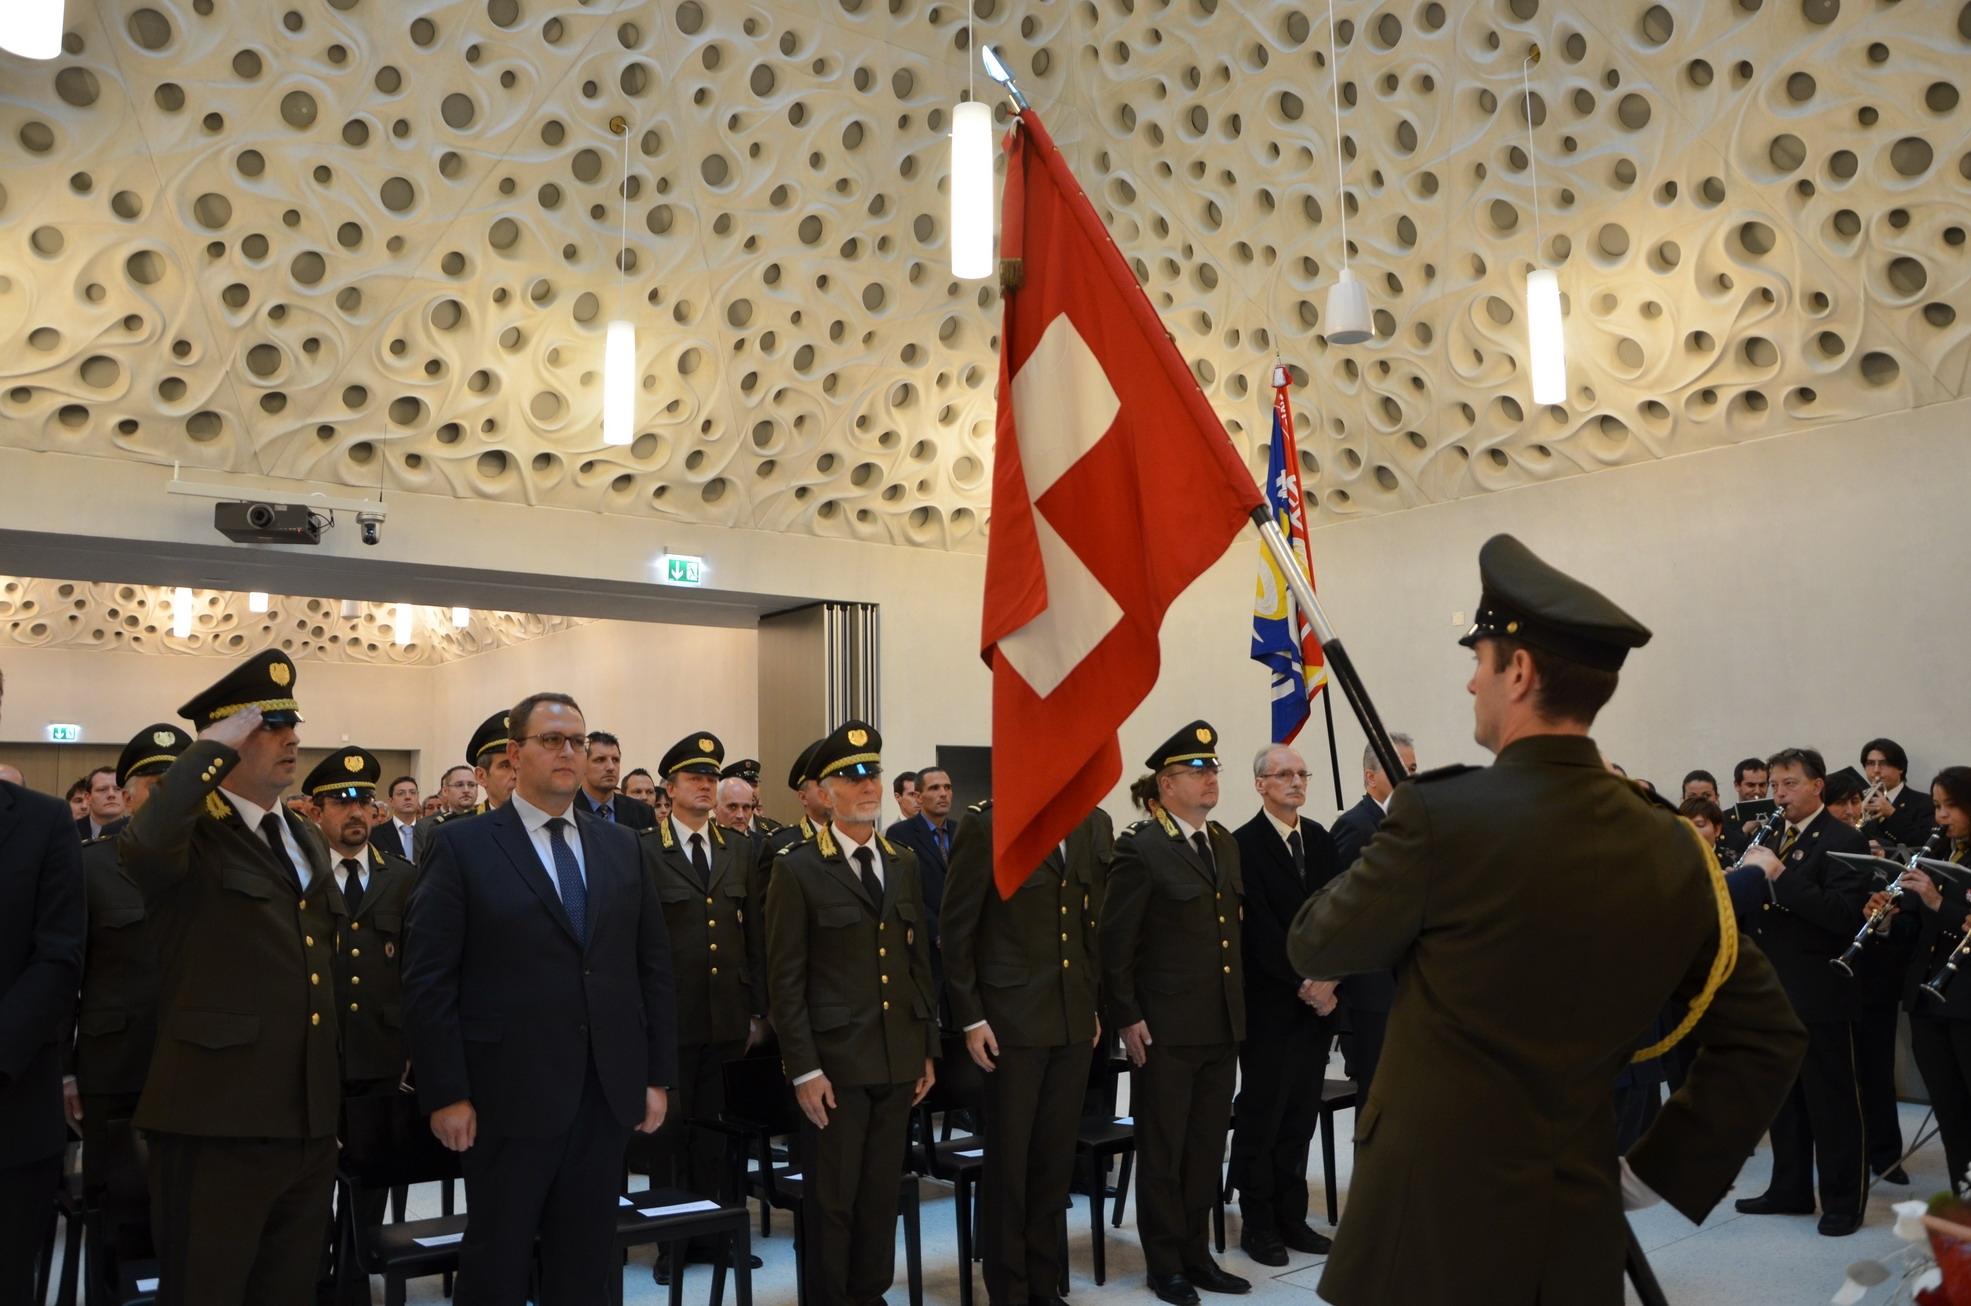 La Polizia cantonale festeggia